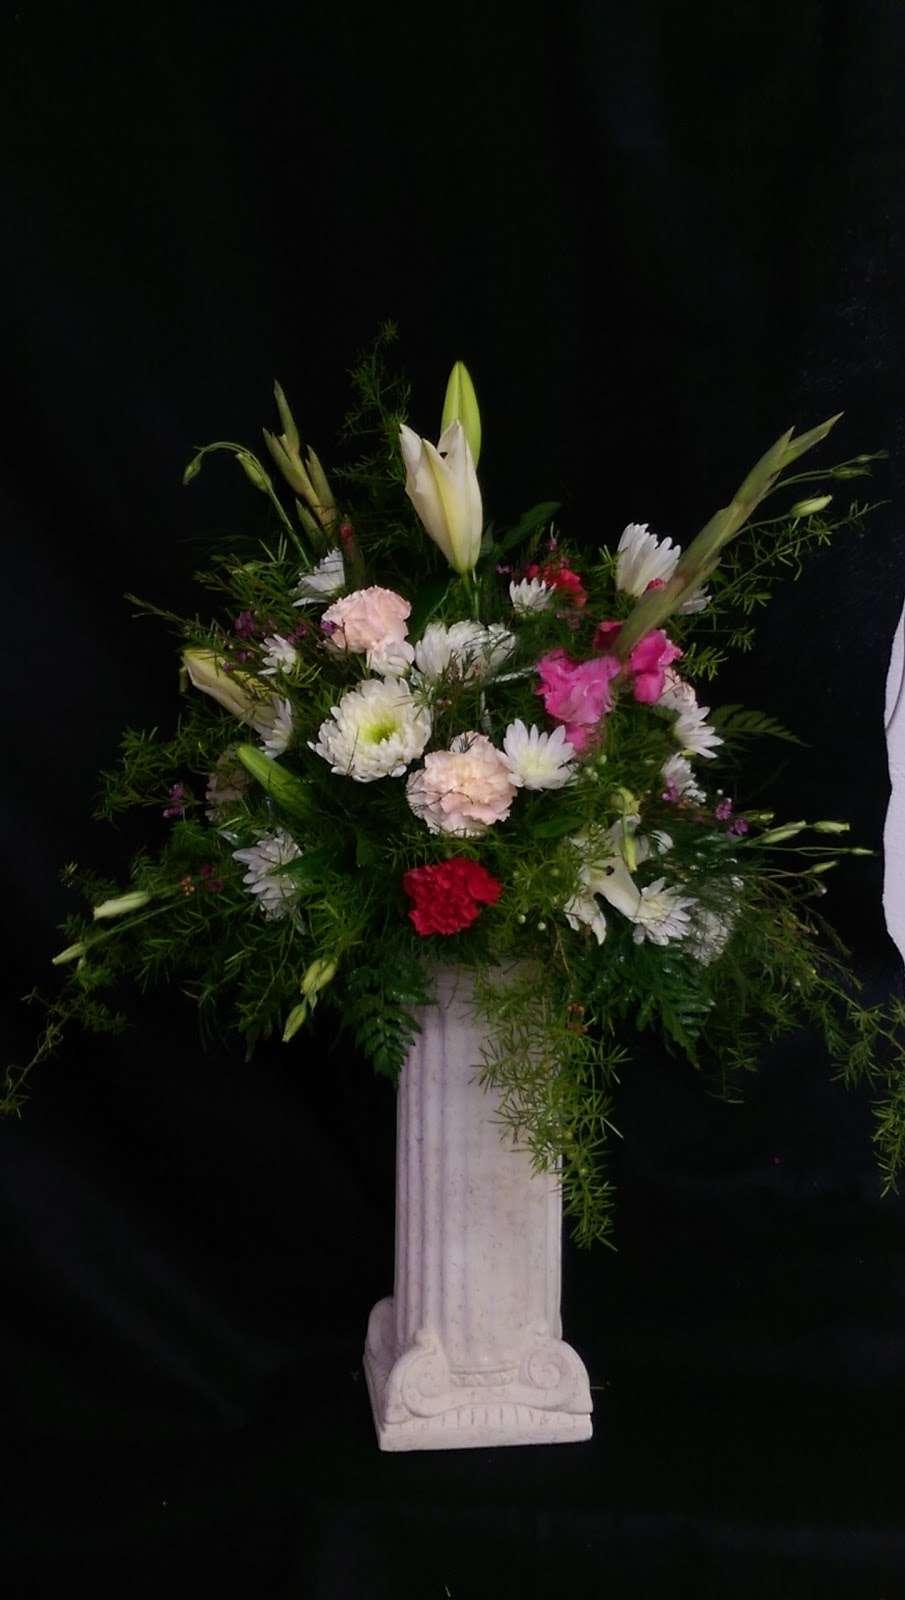 Main Street Flowers - florist    Photo 2 of 4   Address: 10 N 7th St, Crisfield, MD 21817, USA   Phone: (410) 968-0907